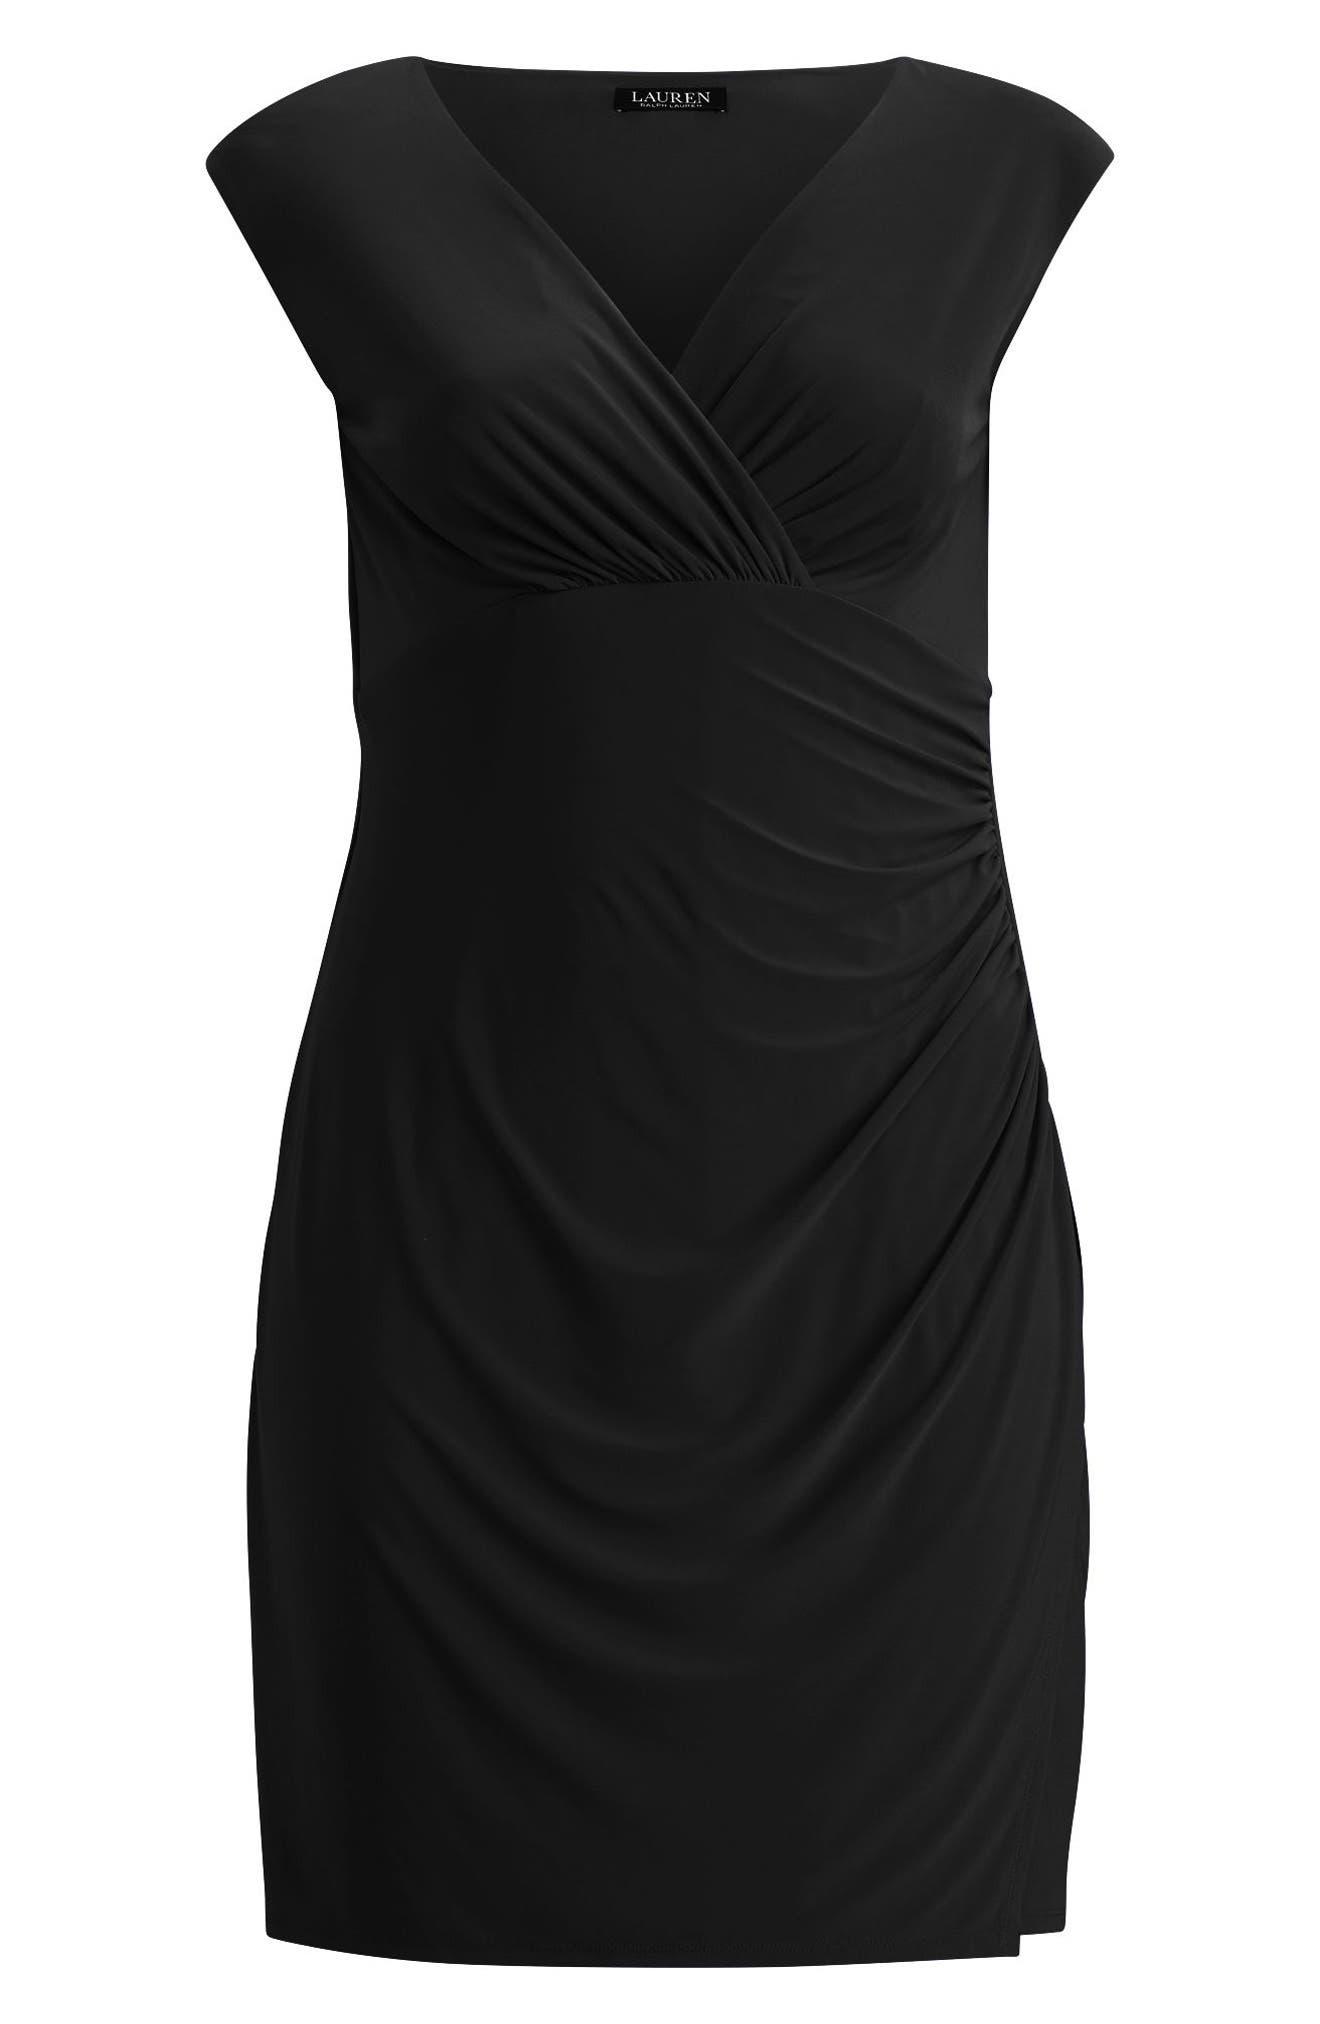 Adara Sheath Dress,                             Alternate thumbnail 3, color,                             Black